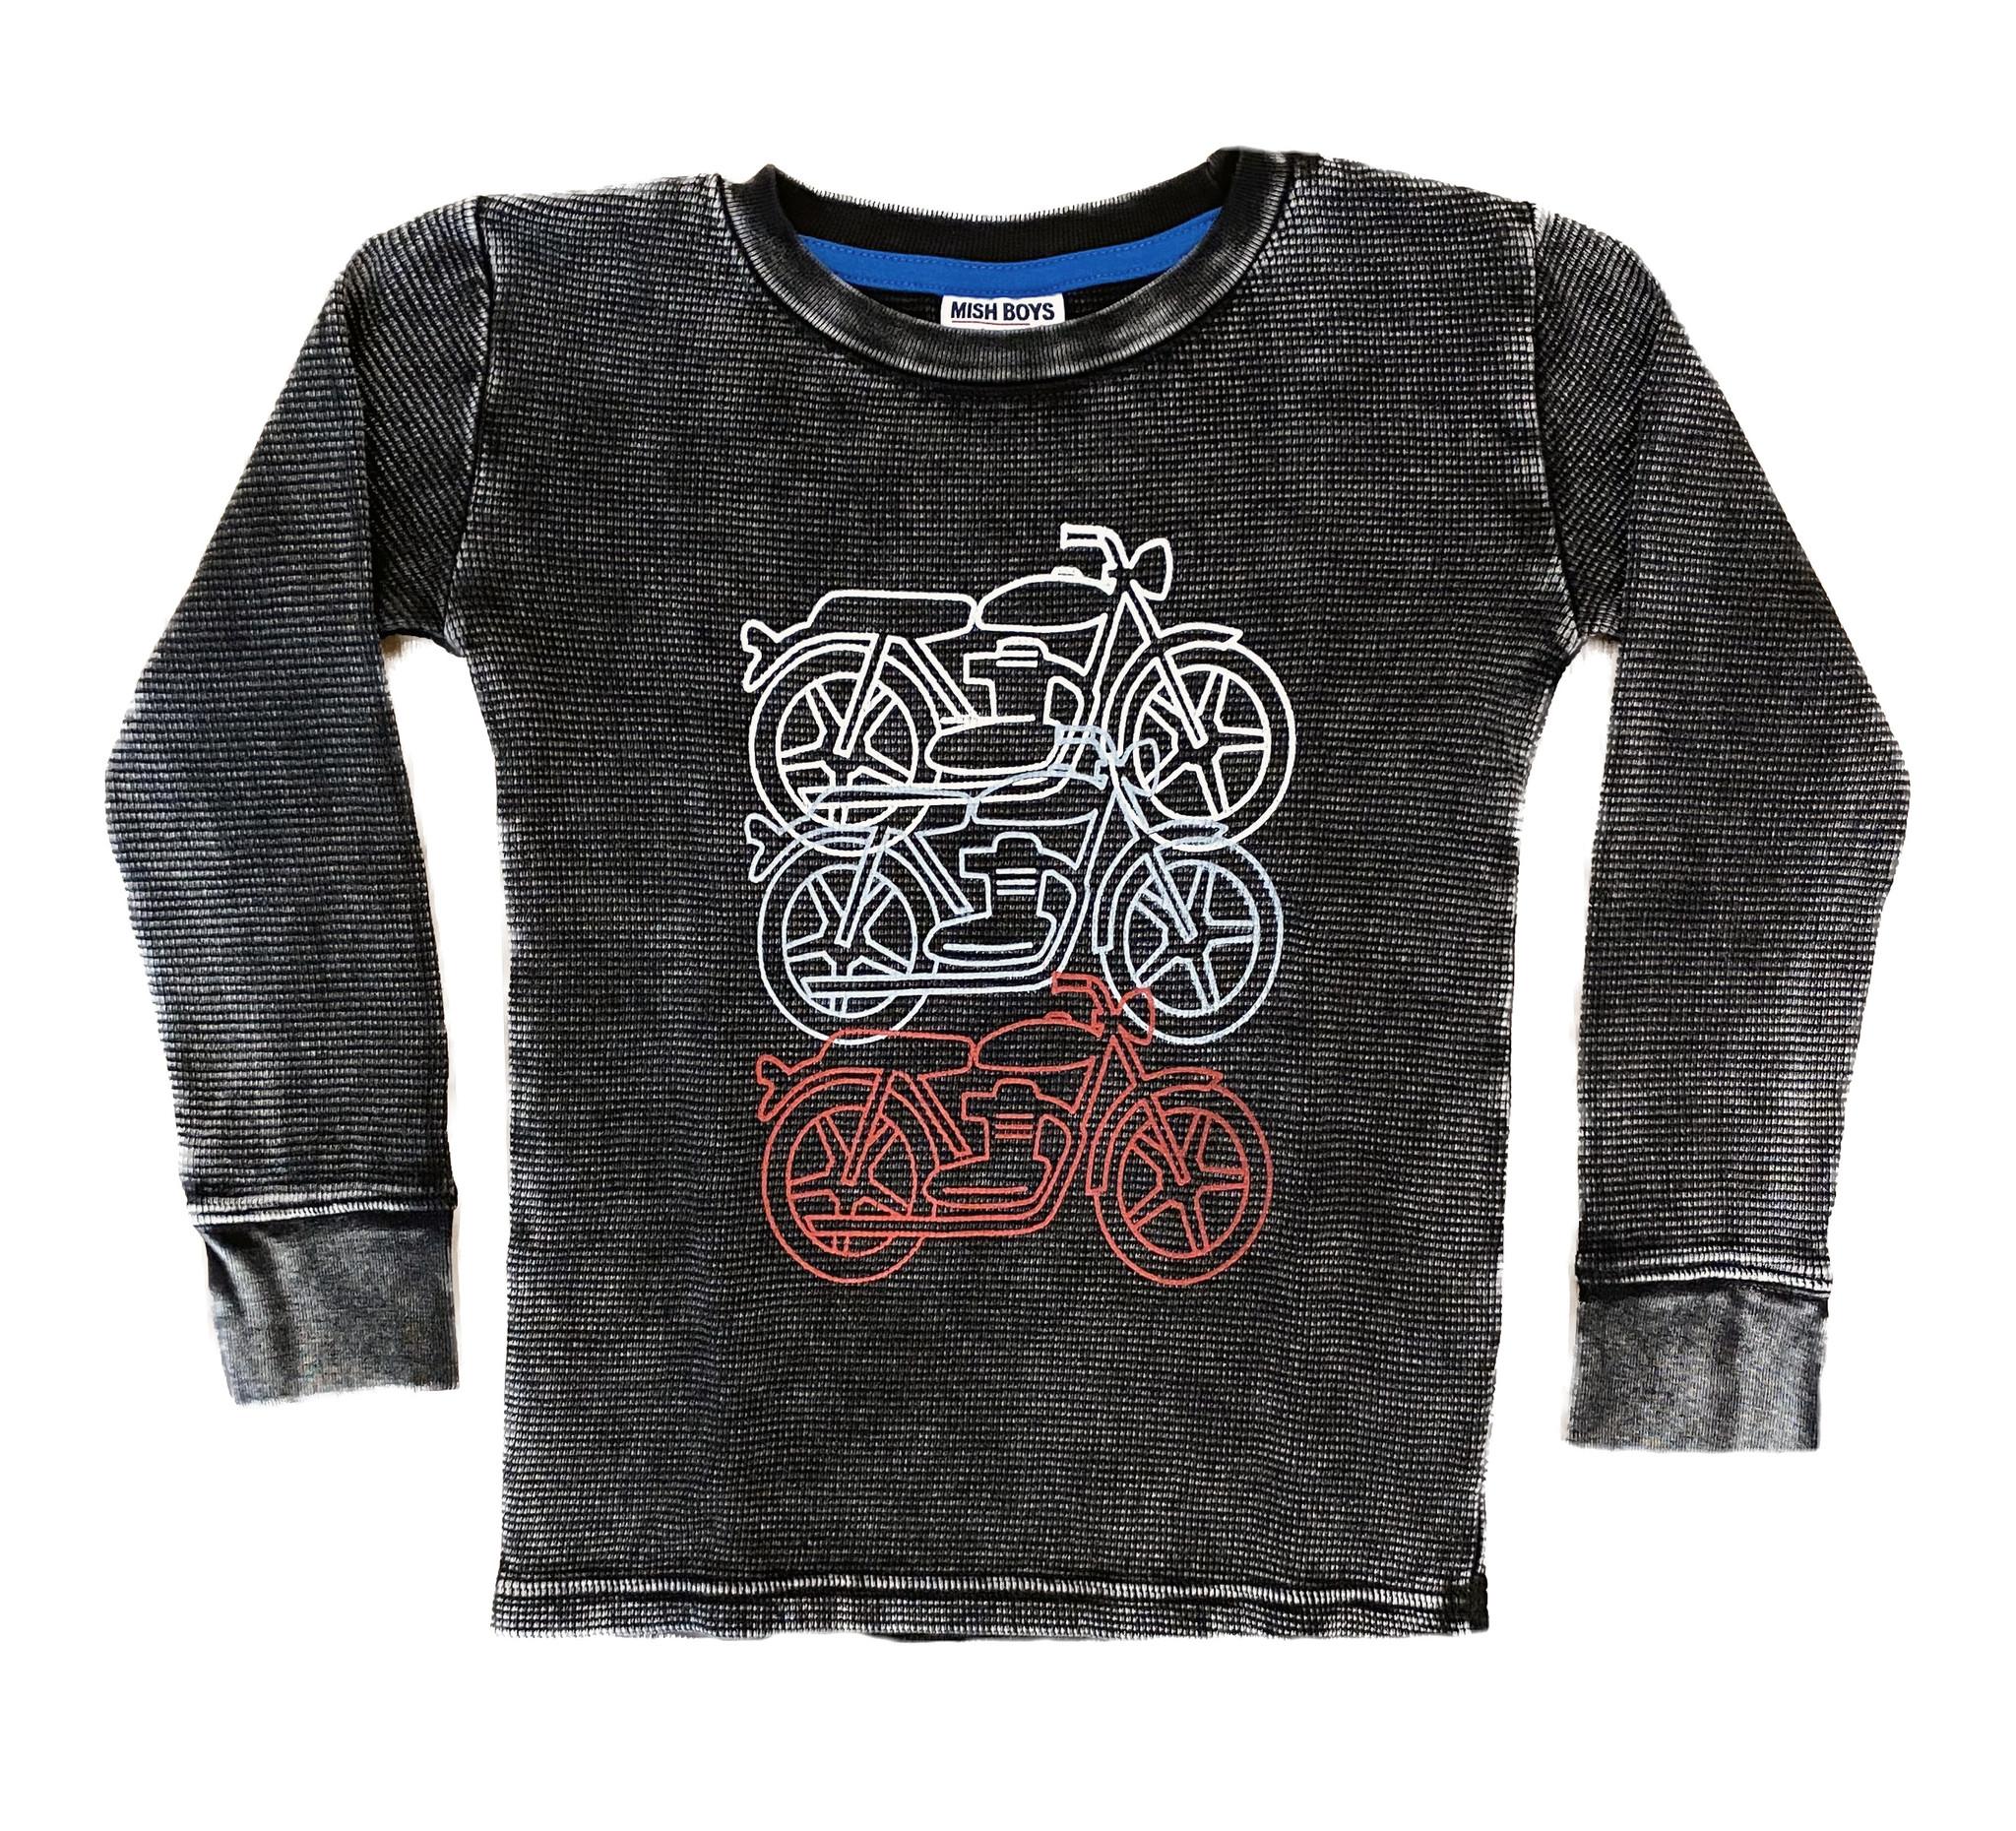 Mish Black Distressed Motorcycle Thermal Infant Tee